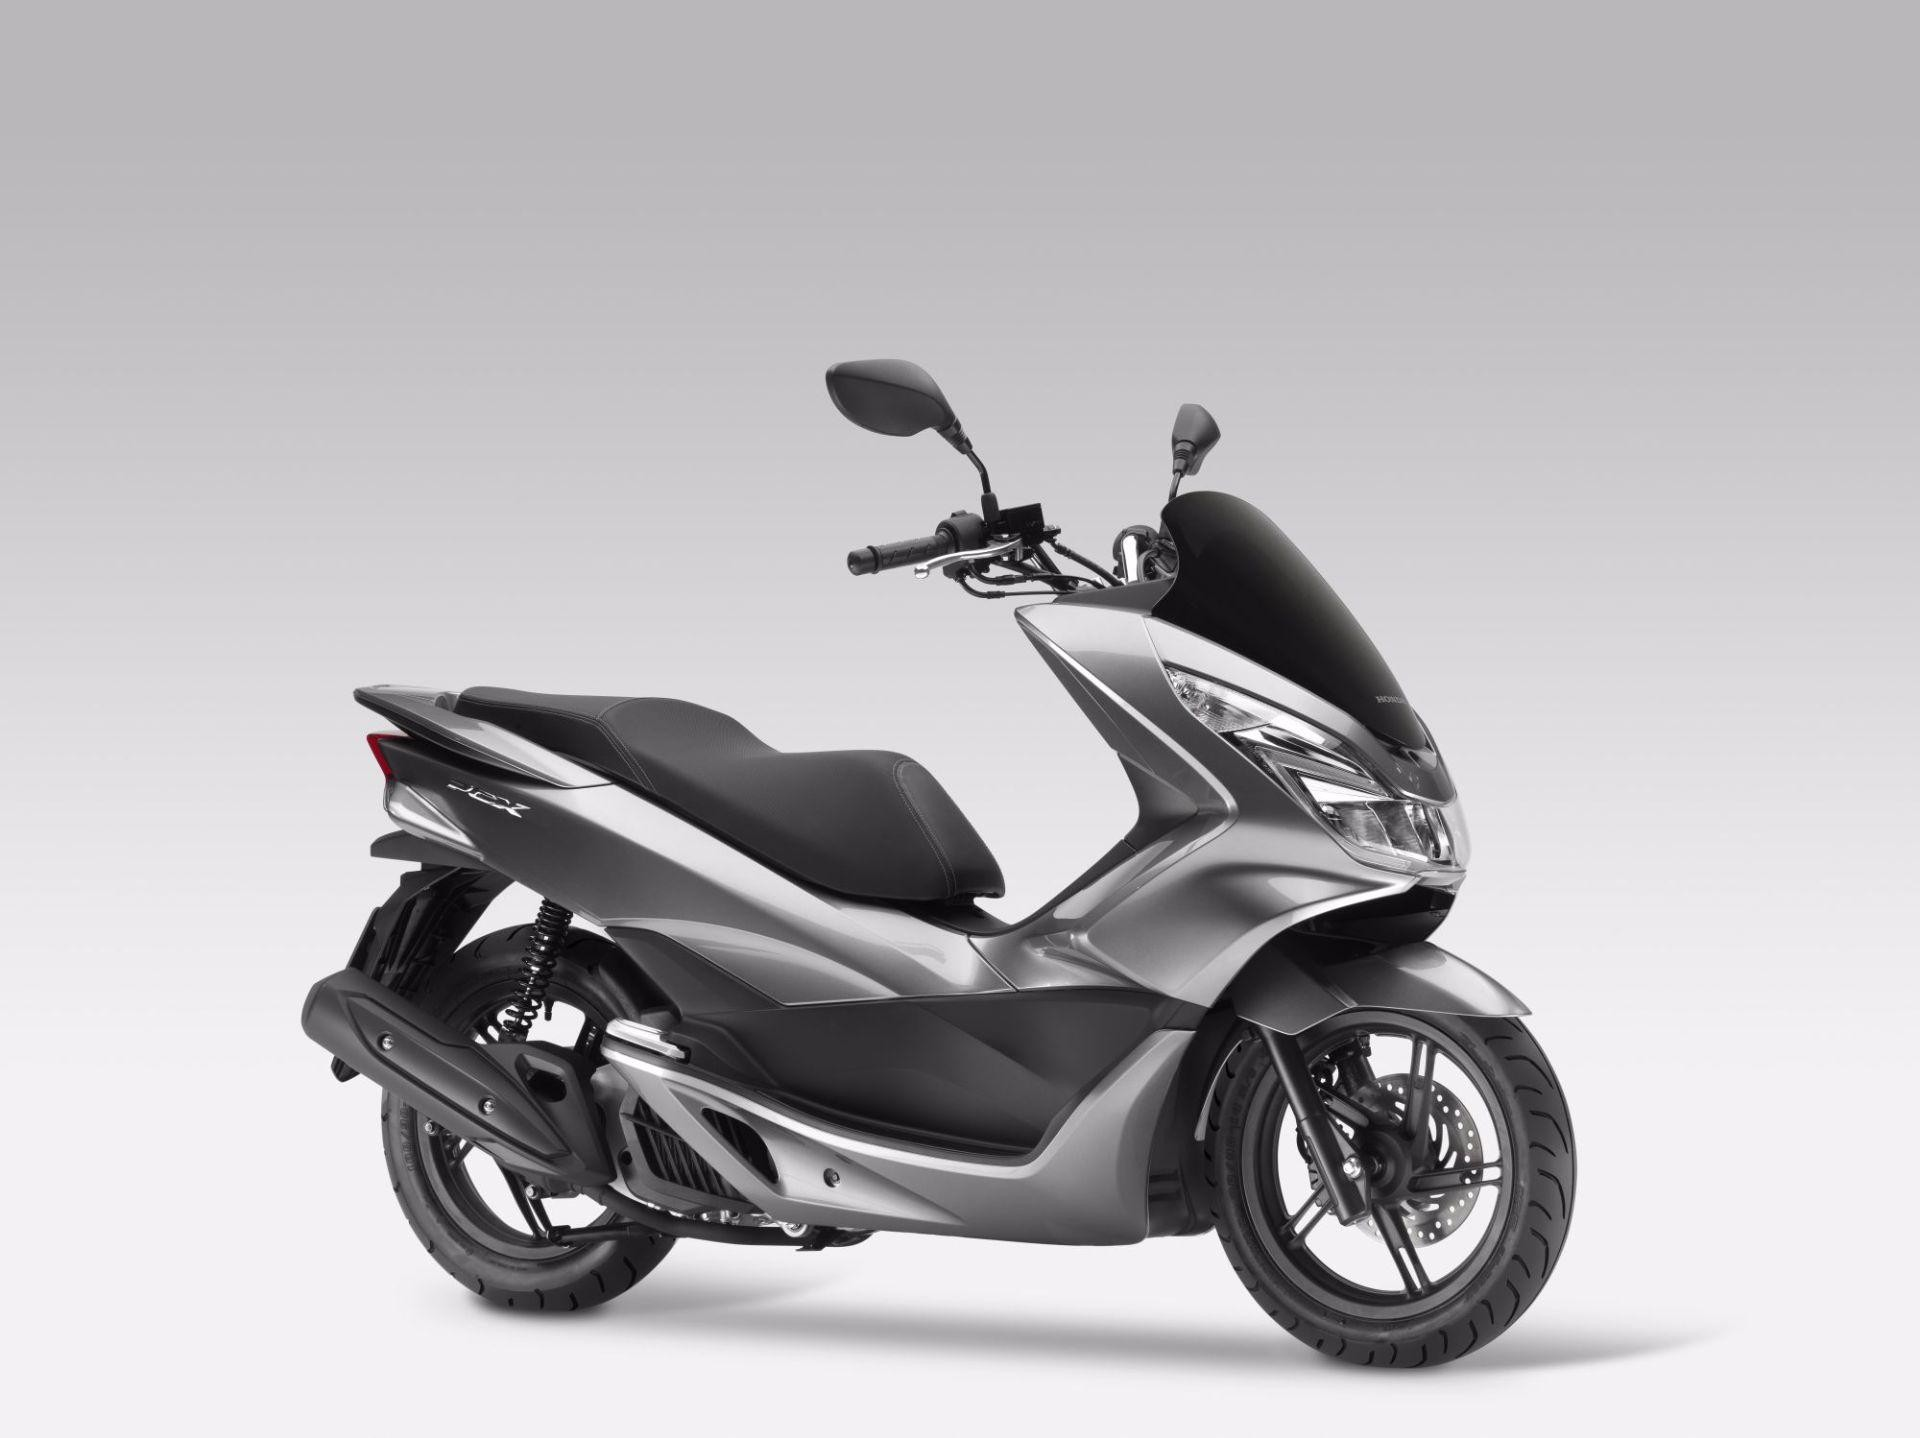 moto scooter pcx